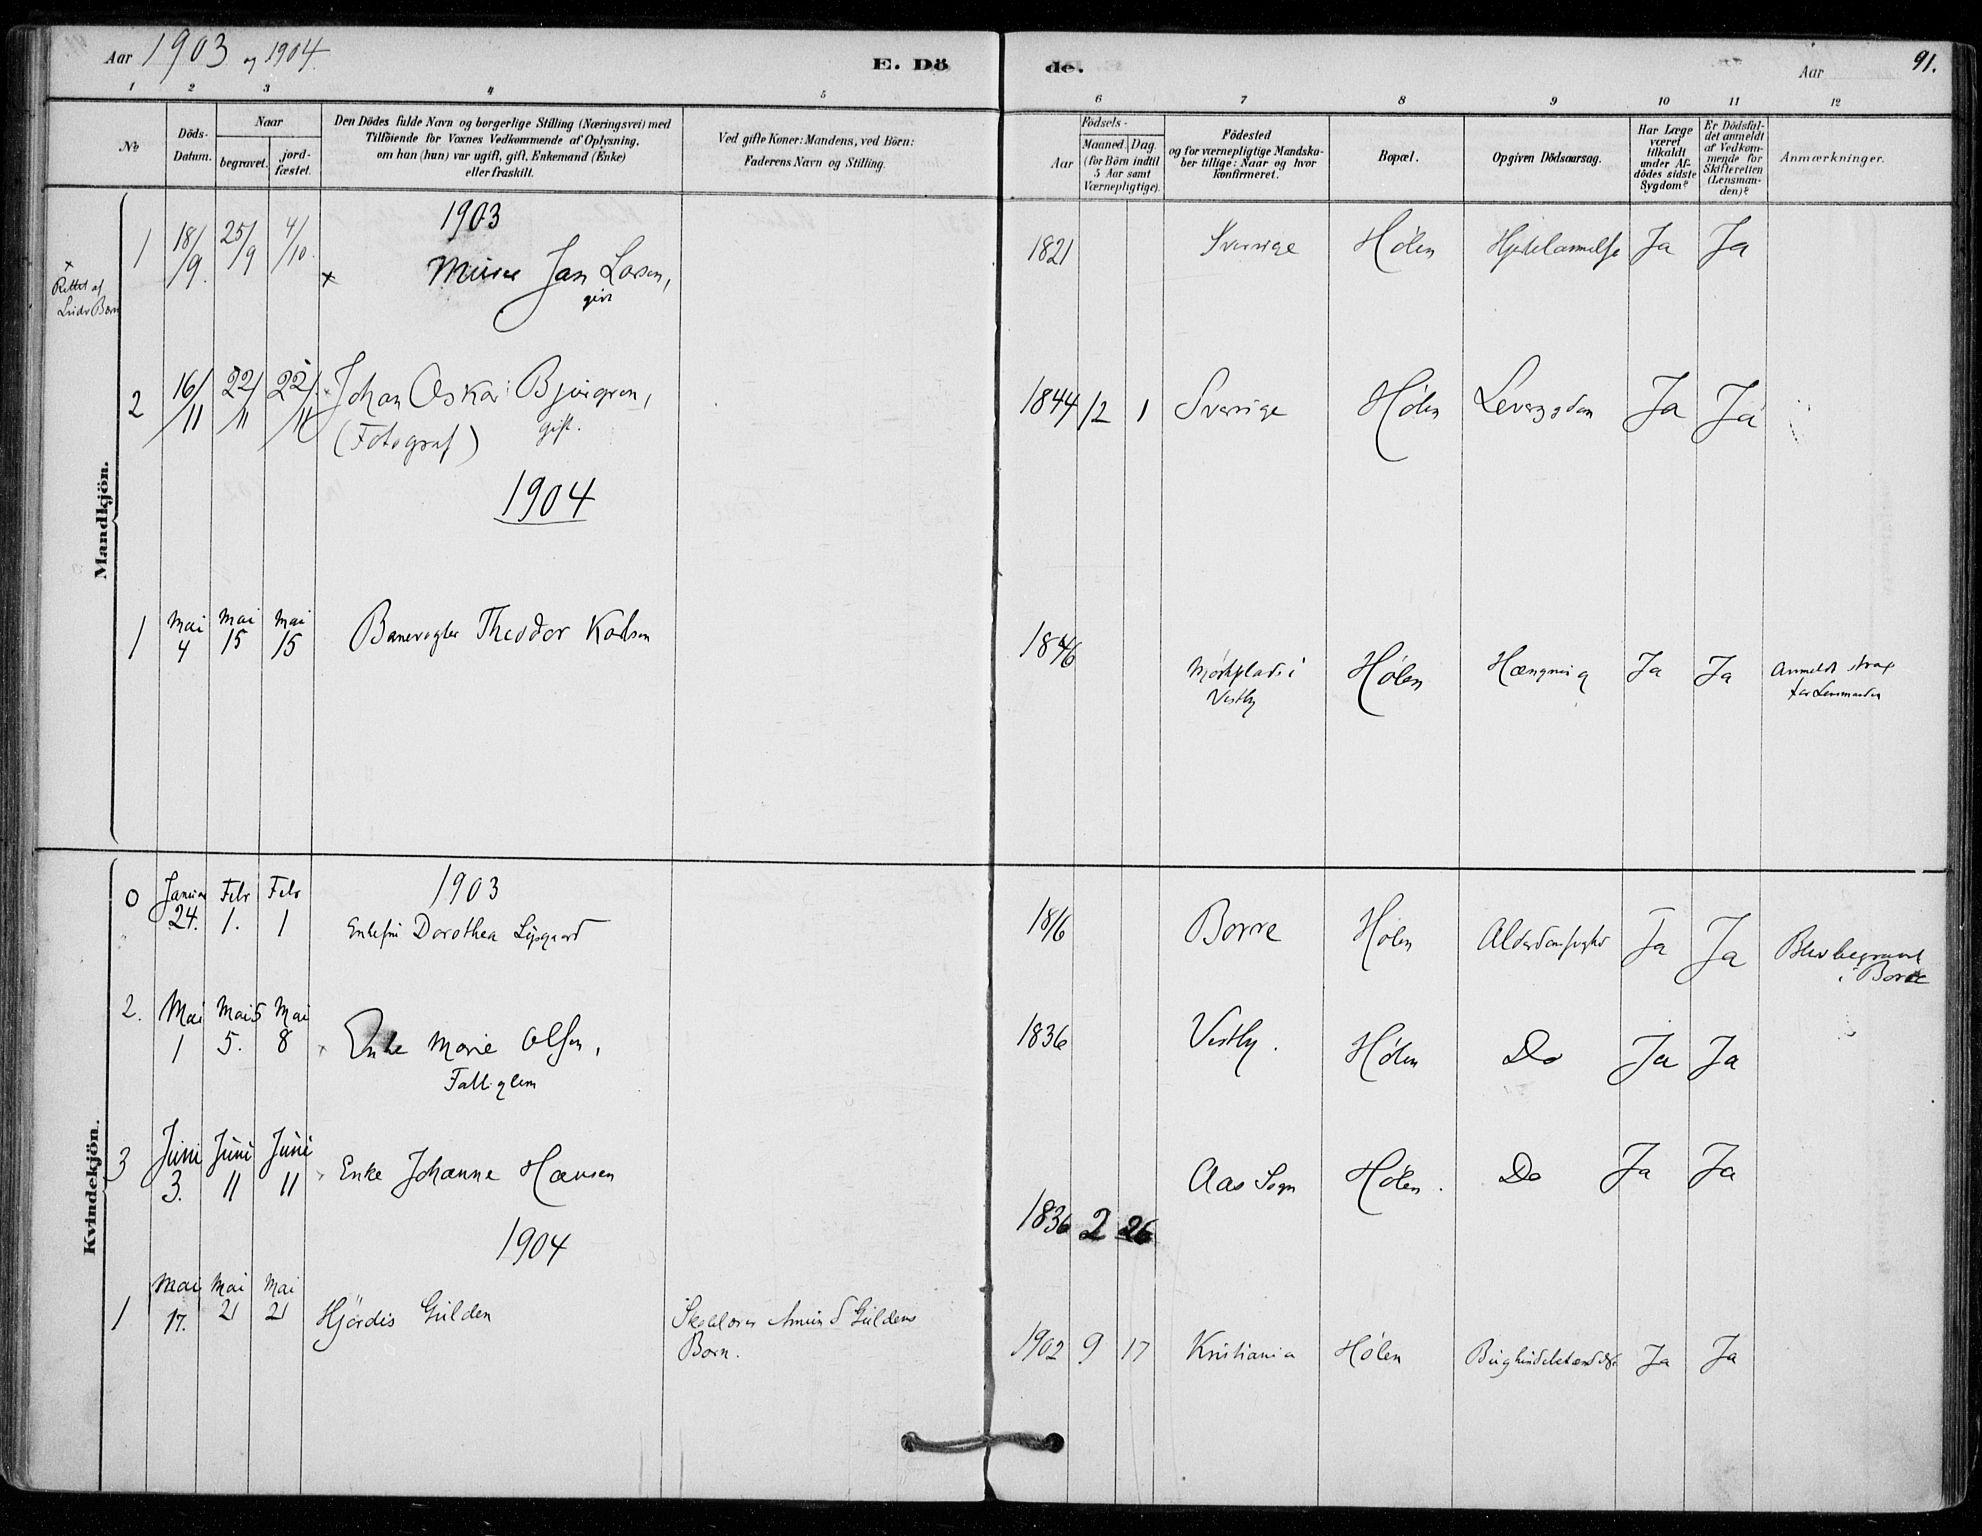 SAO, Vestby prestekontor Kirkebøker, F/Fe/L0001: Ministerialbok nr. V 1, 1878-1931, s. 91